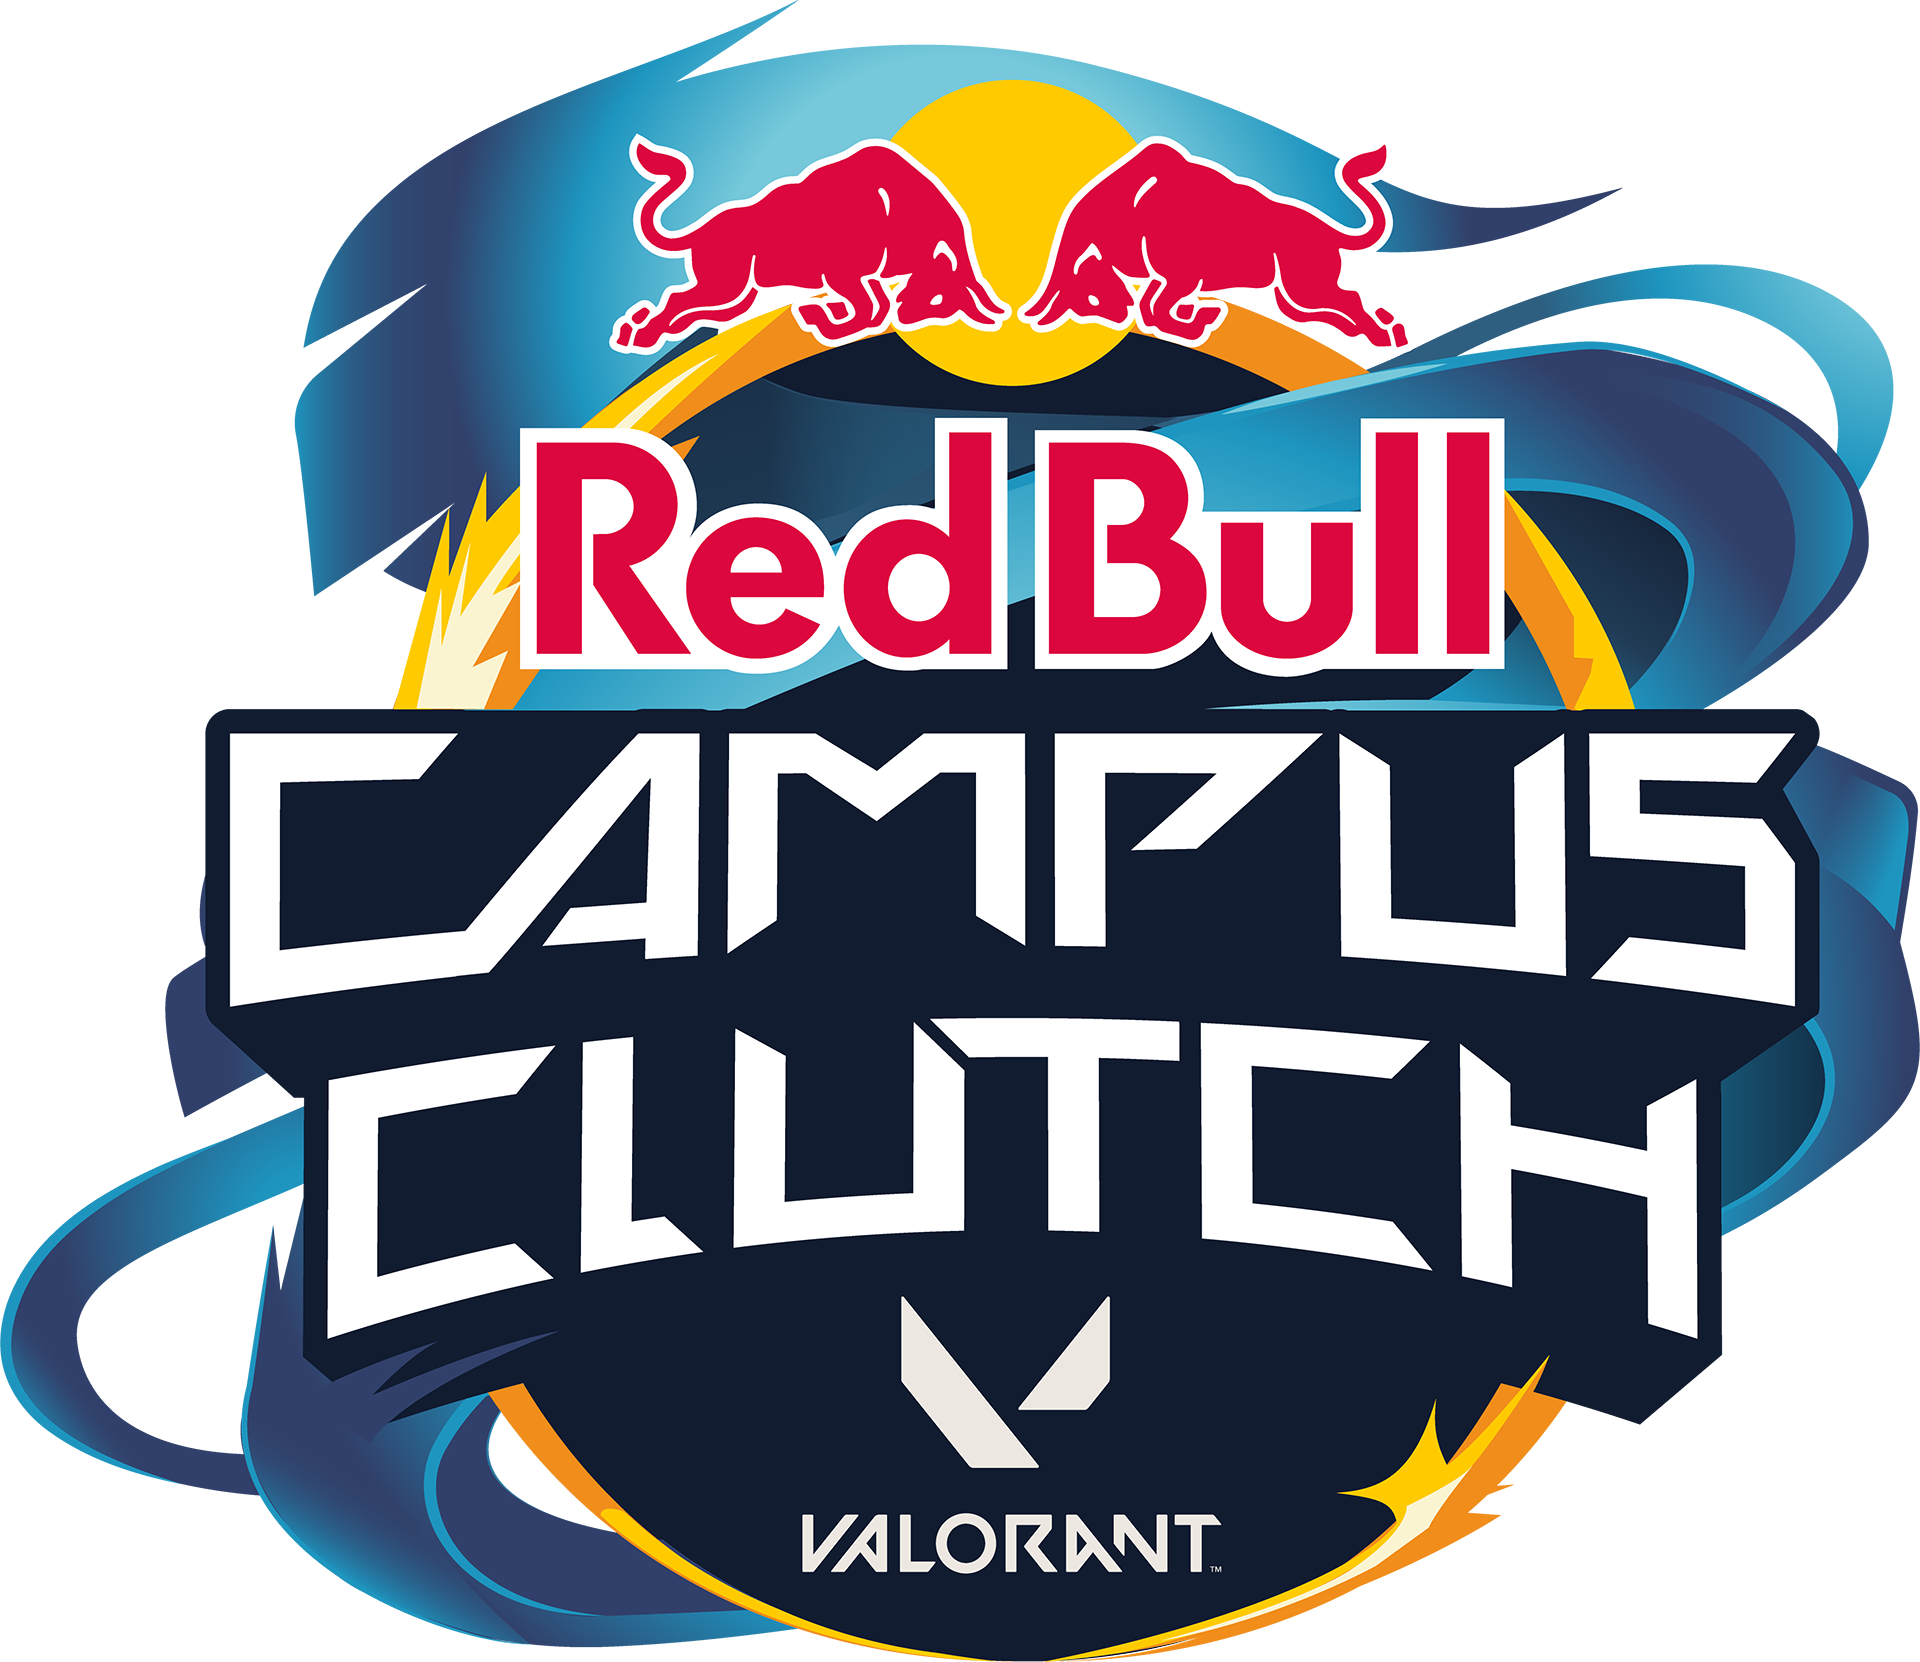 Red Bull Campus Clutch - Valorant